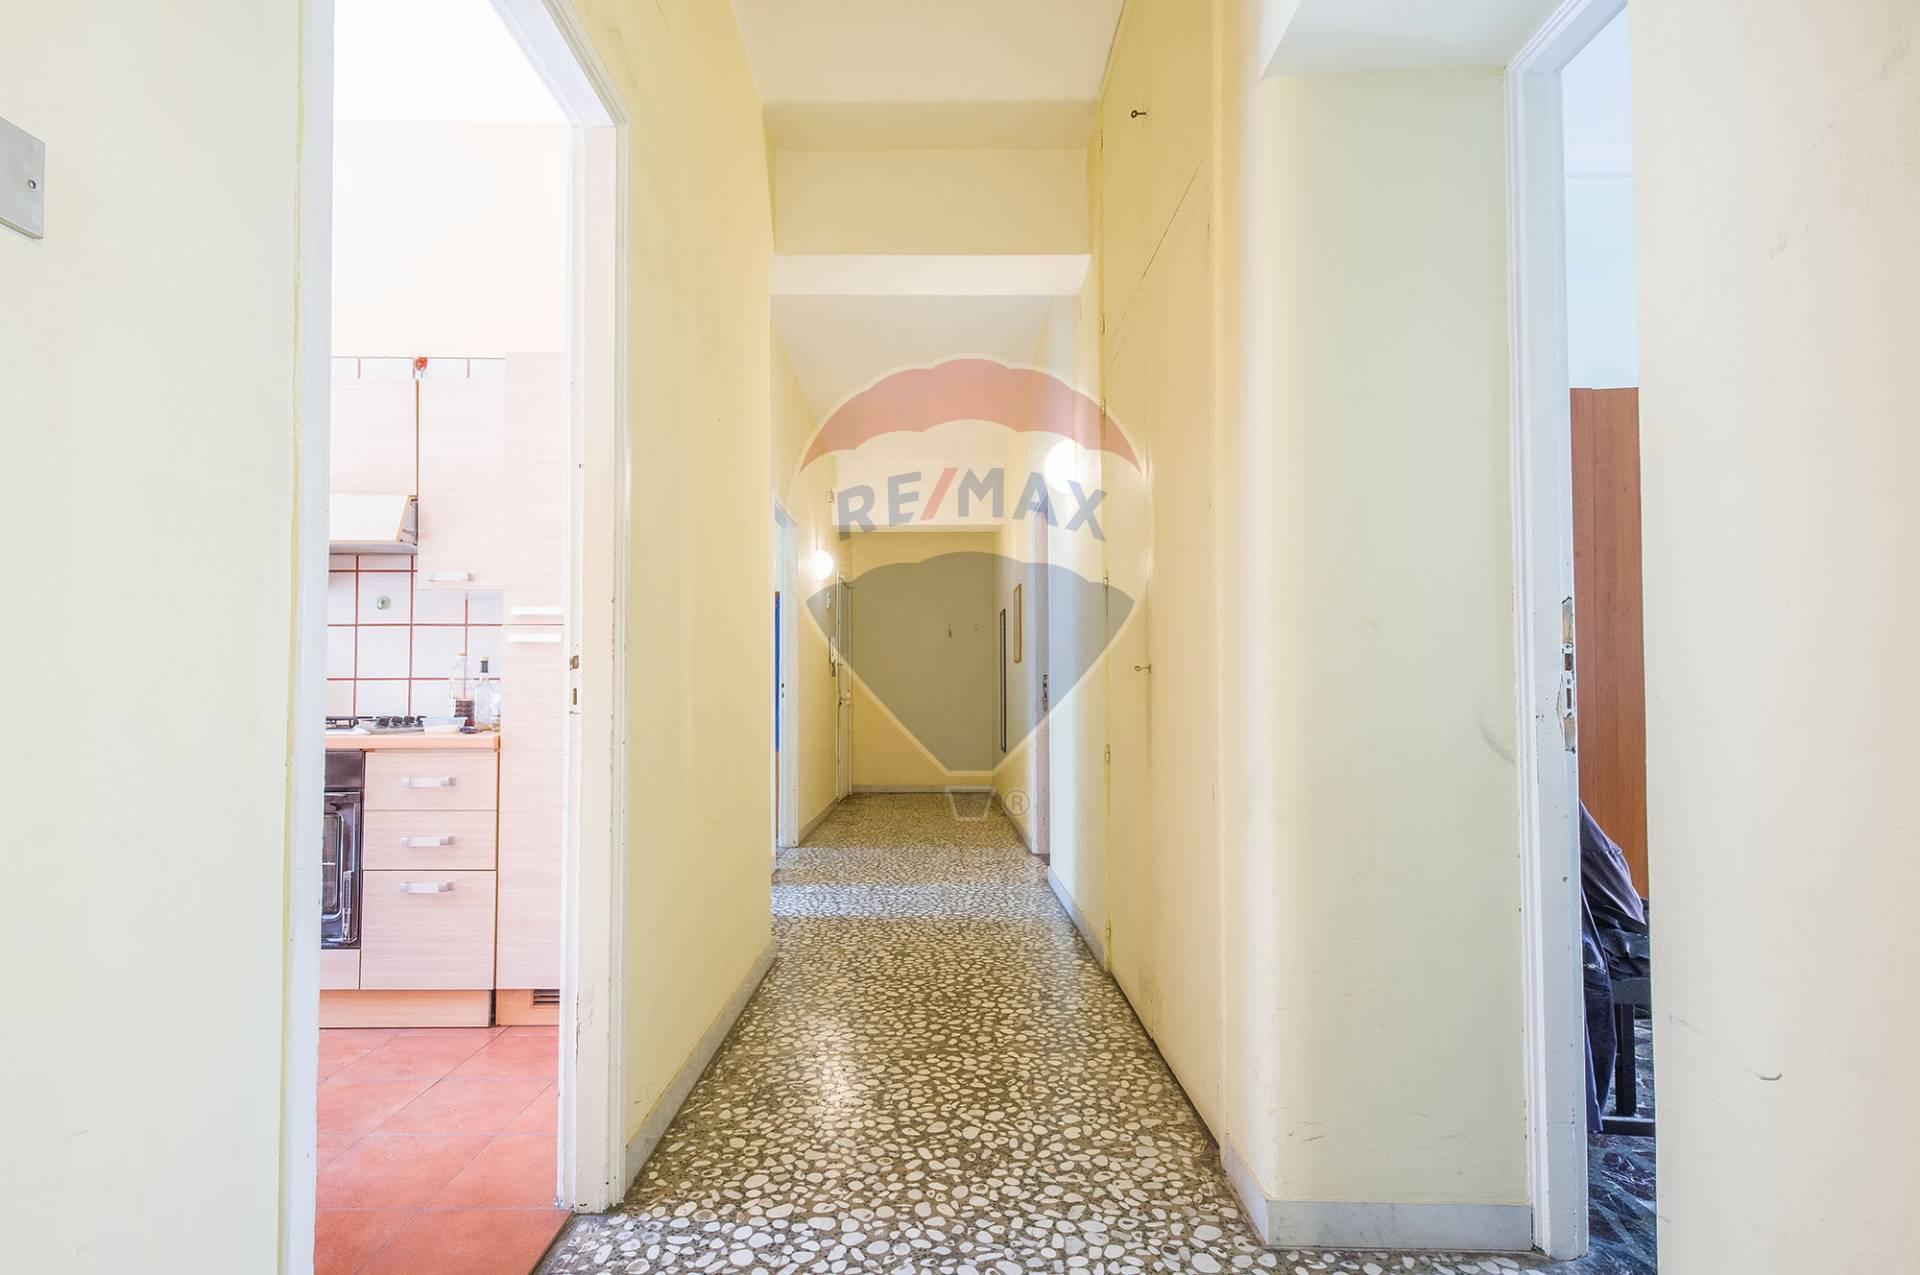 catania vendita quart: catania-italia,africa,jonio,europa,tribunale,xx se re-max-city-home